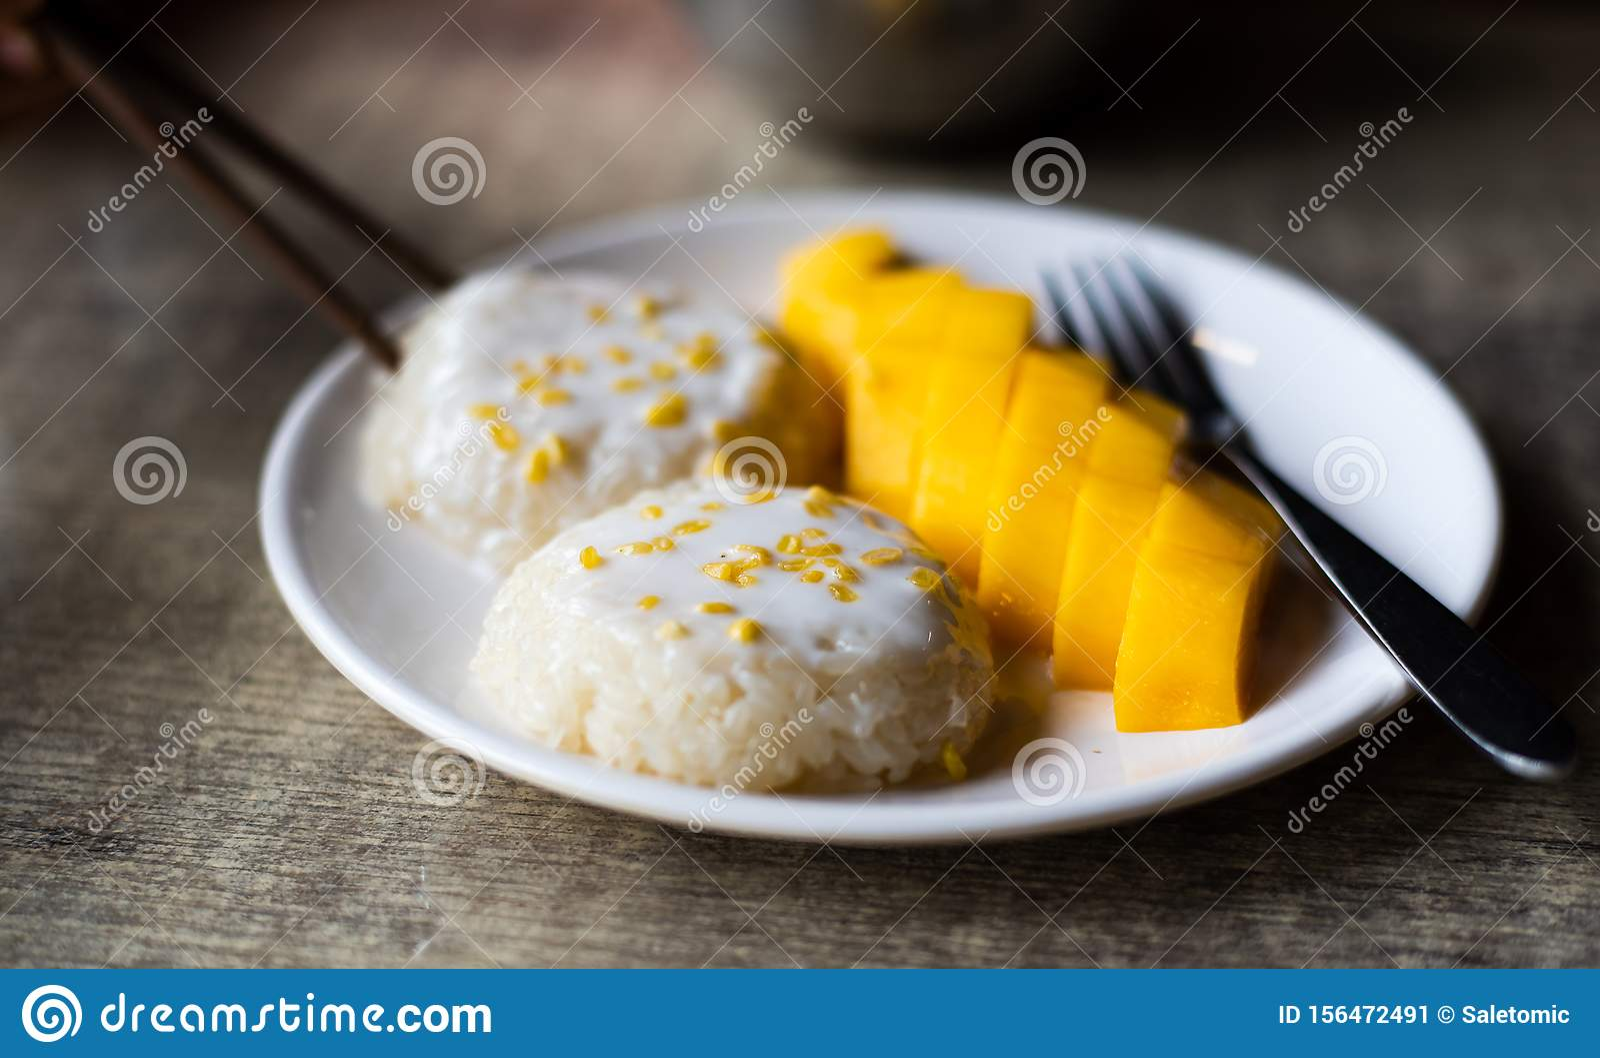 Mango Sticky Rice Thai Asian Dessert Stock Image - Image ...